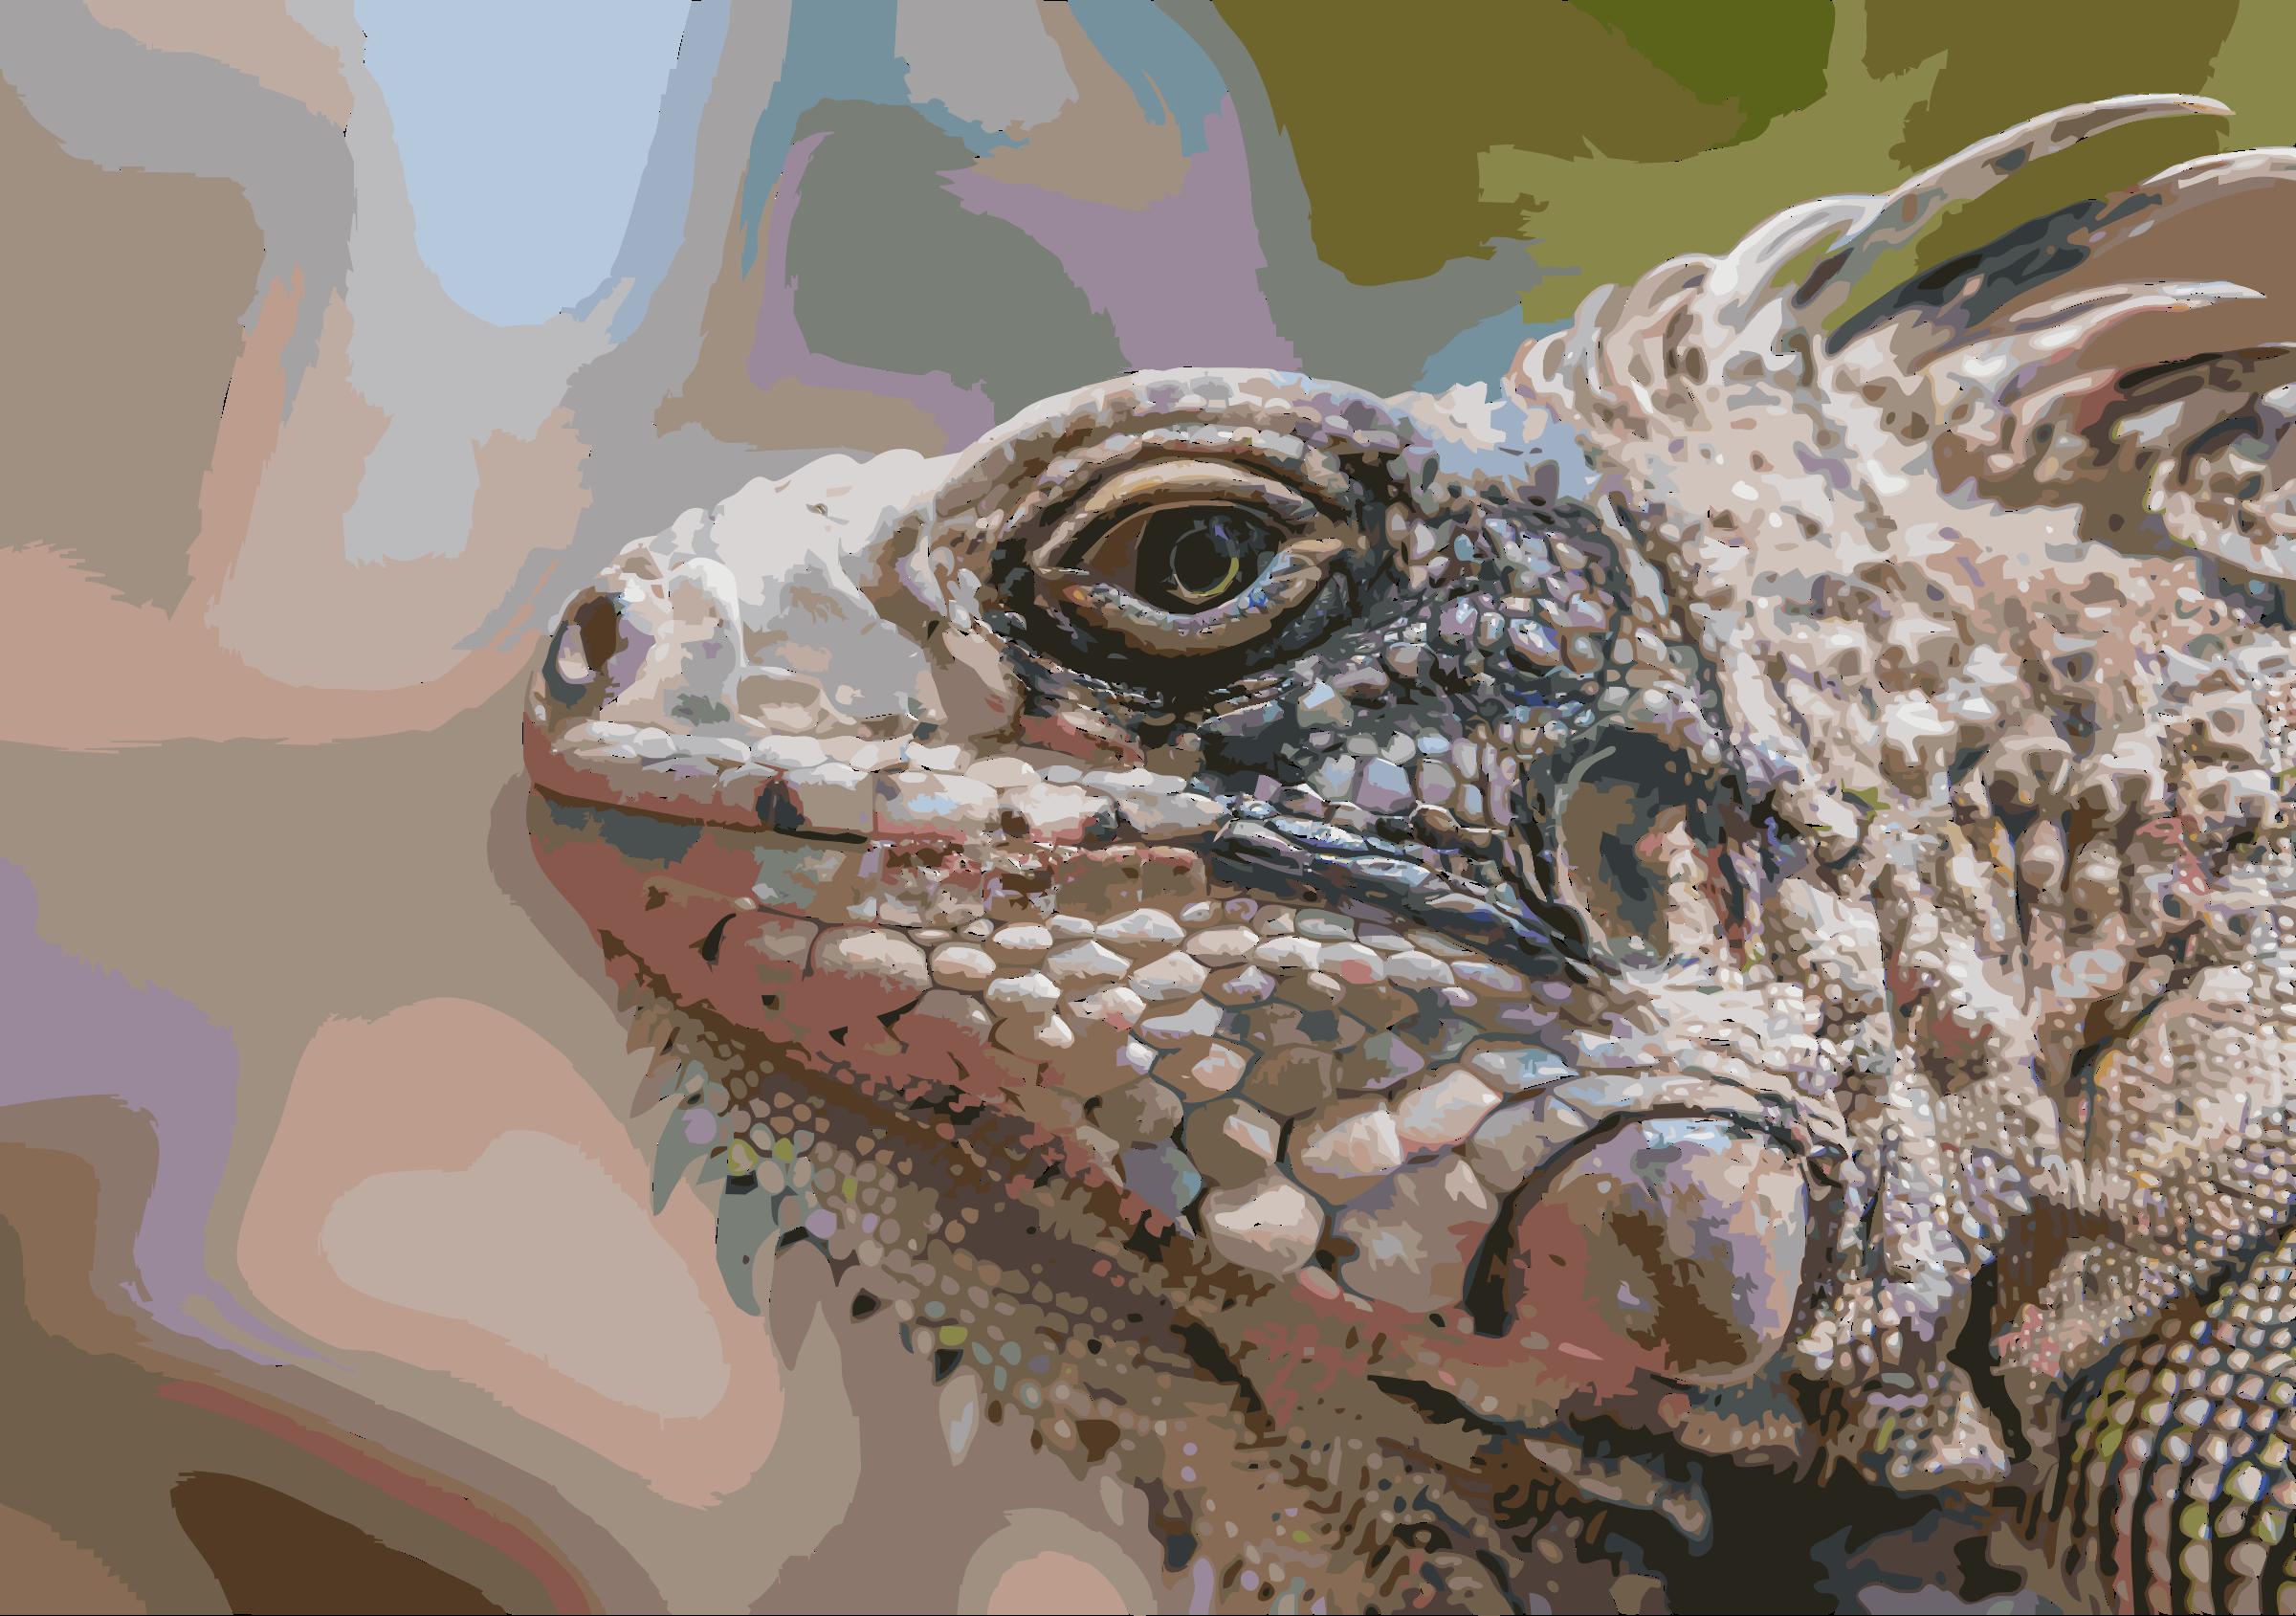 Green Iguana svg #12, Download drawings